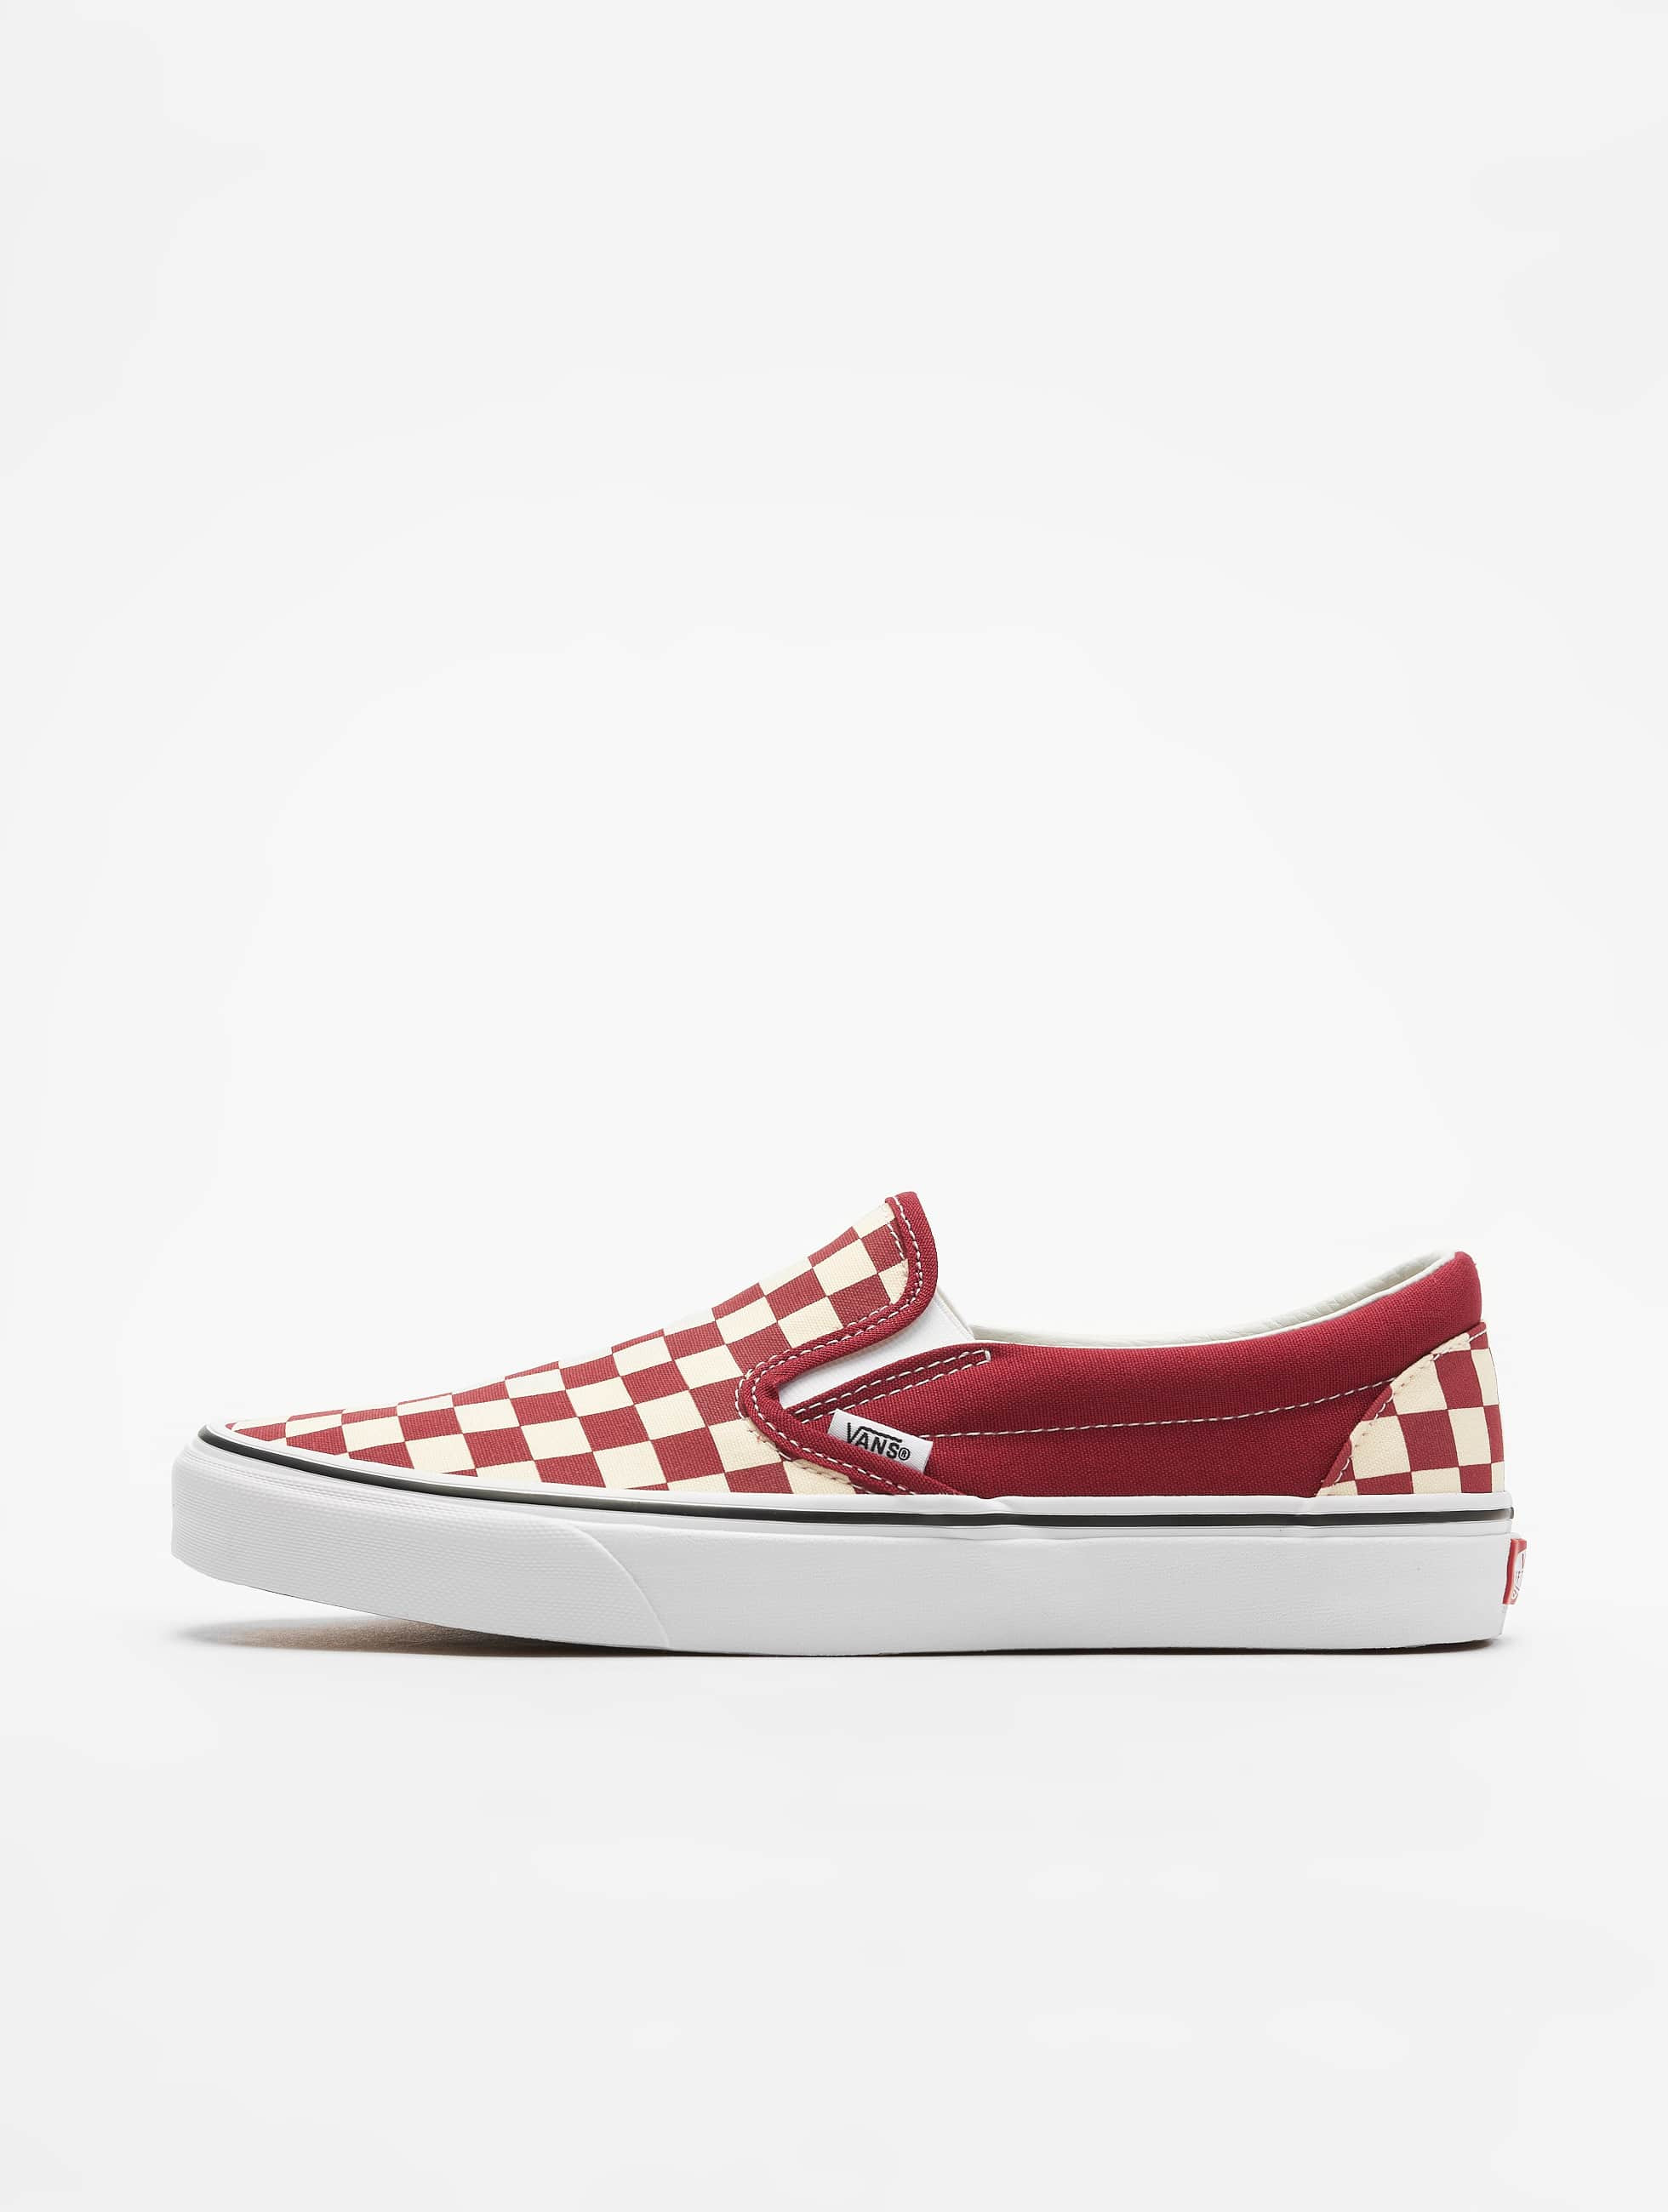 cdc67926e93 Vans Skor / Sneakers UA Classic Slip-On i röd 632193